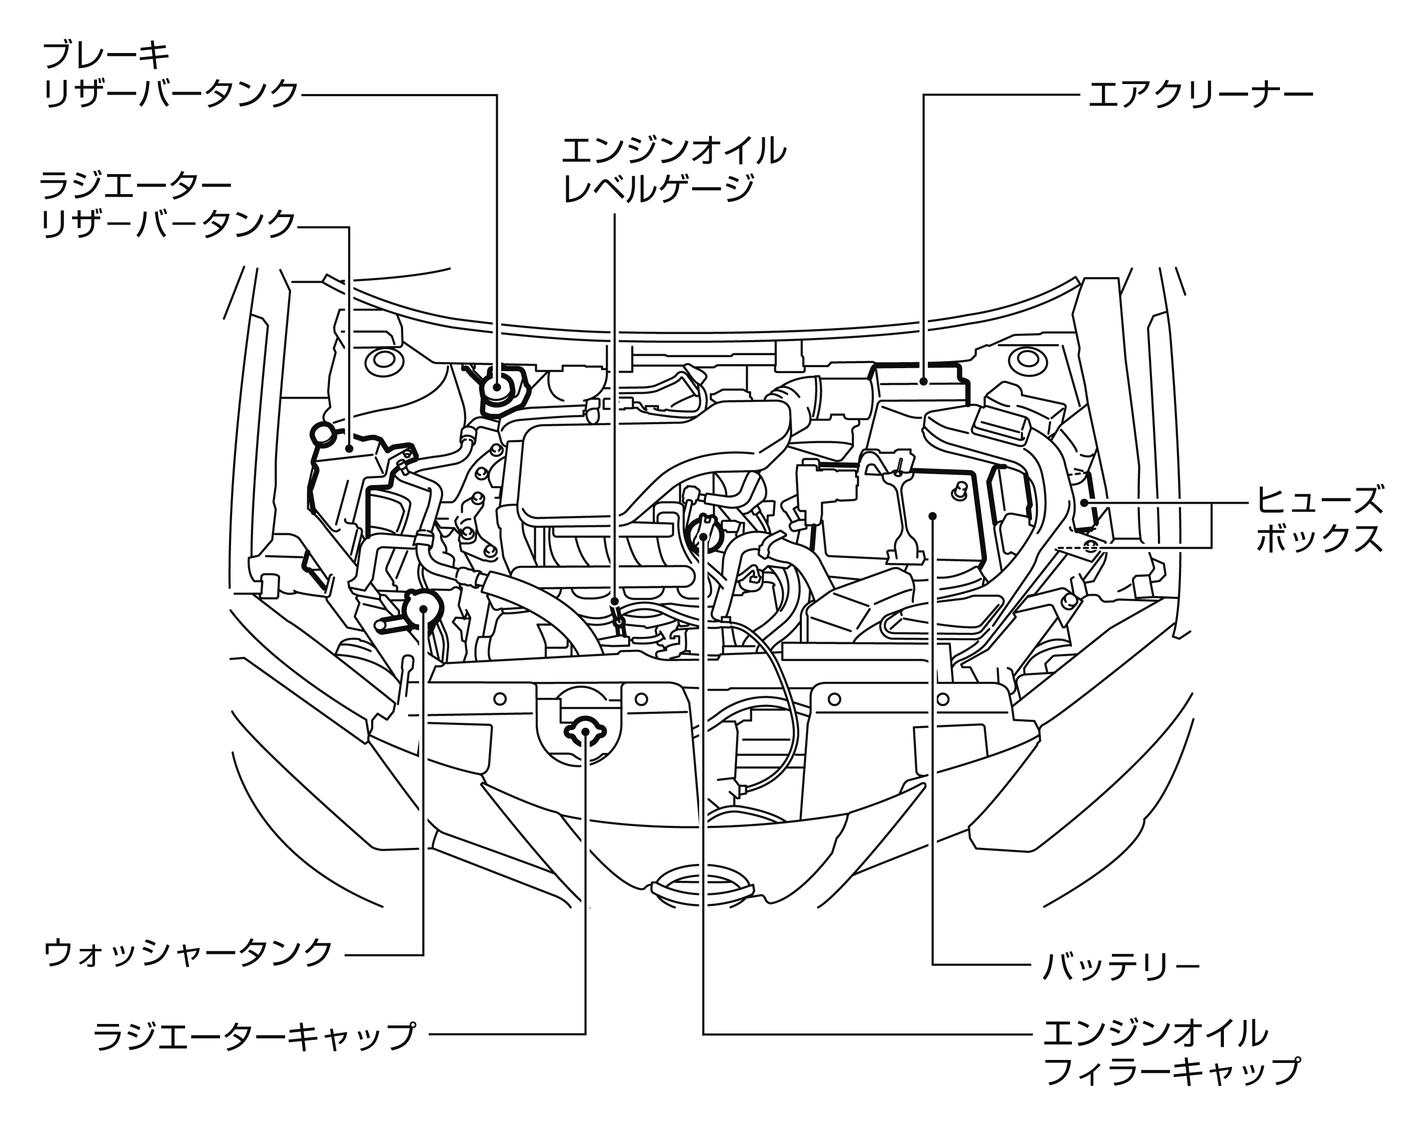 2000 Toyota Land Cruiser Prado Electrical Wiring Diagram further P moreinfo besides Kolorowanki Samochody also Disable furthermore Serpentine Belt Diagram 2009 Toyota Camry V6 35 Liter Engine 06999. on nissan rav4